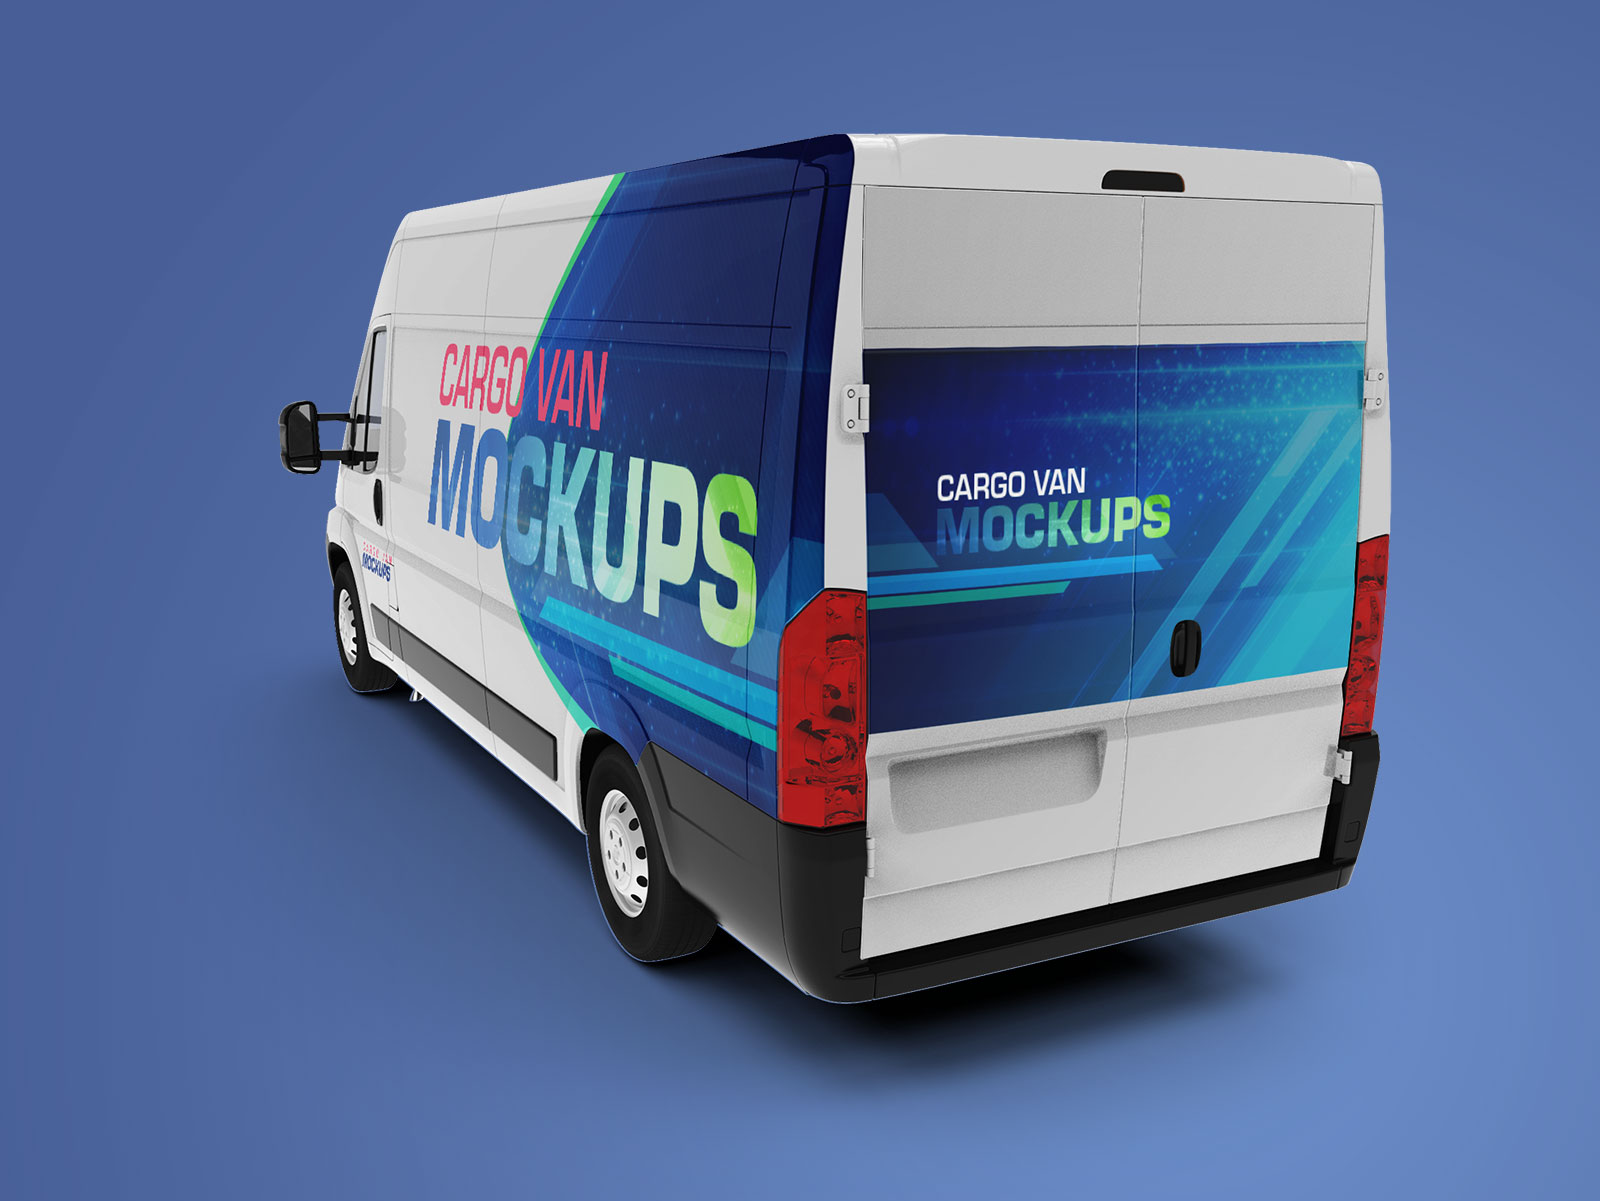 Free-Cargo-Express-Van-Mockup-PSD-file